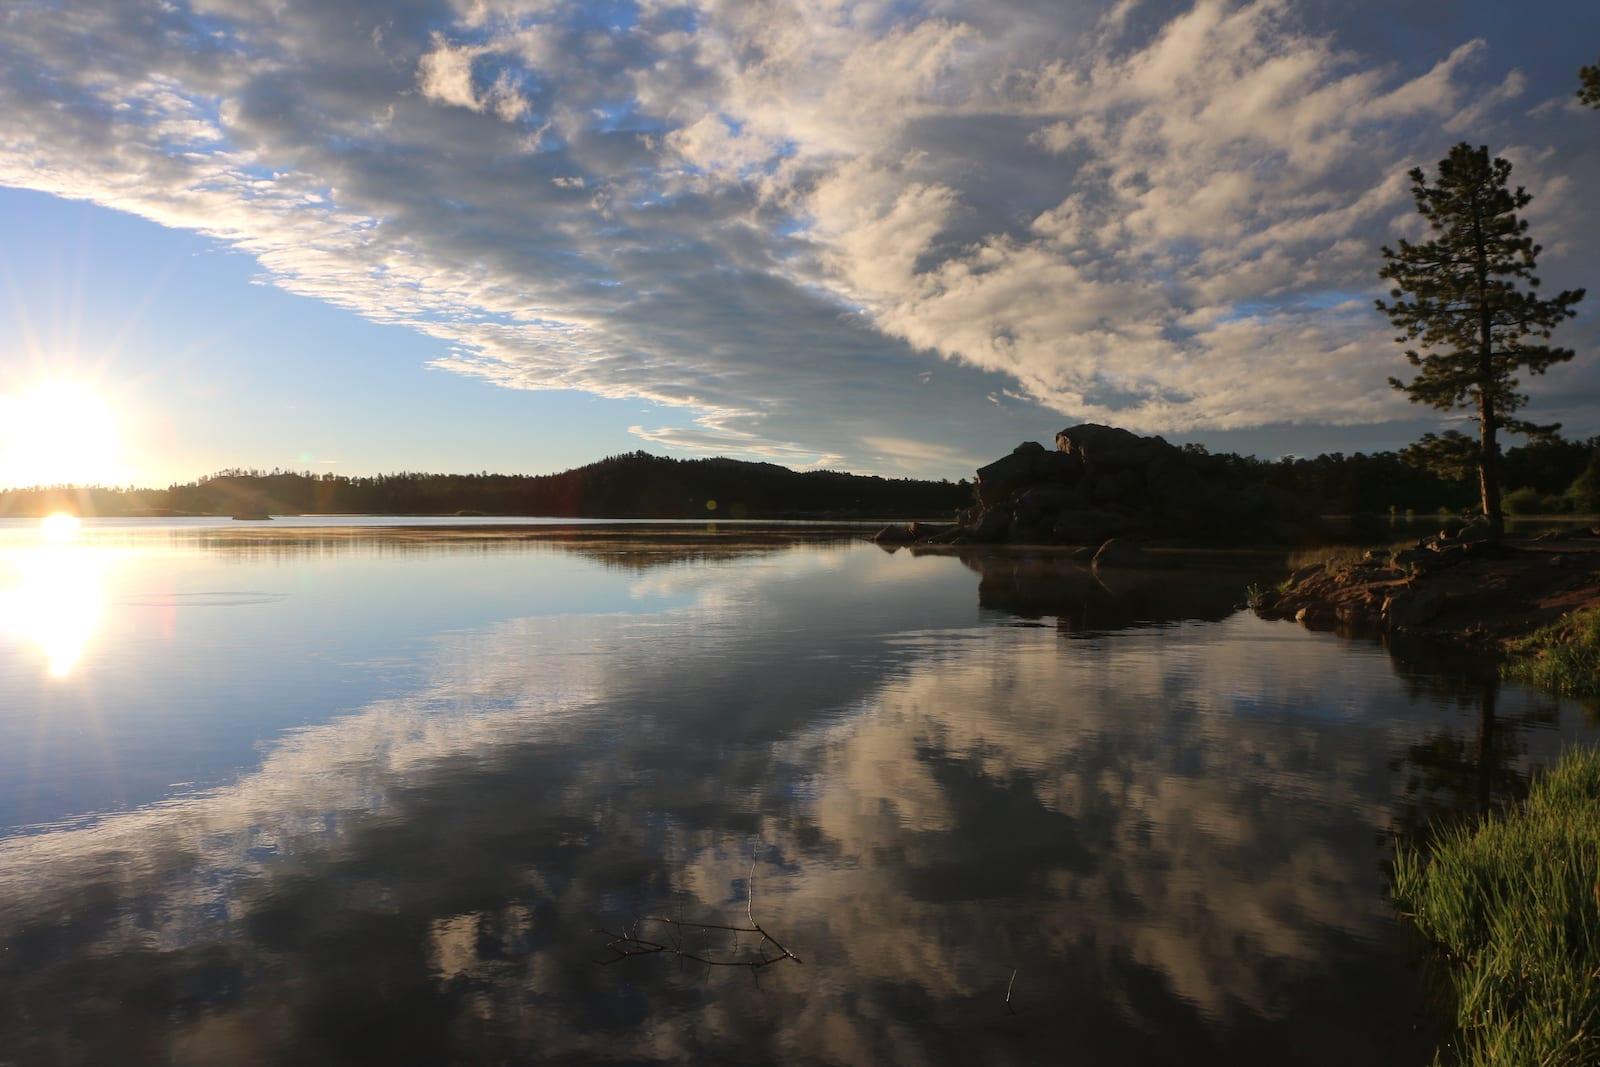 Dowdy Lake Sunrise with Evergreen Tree Colorado